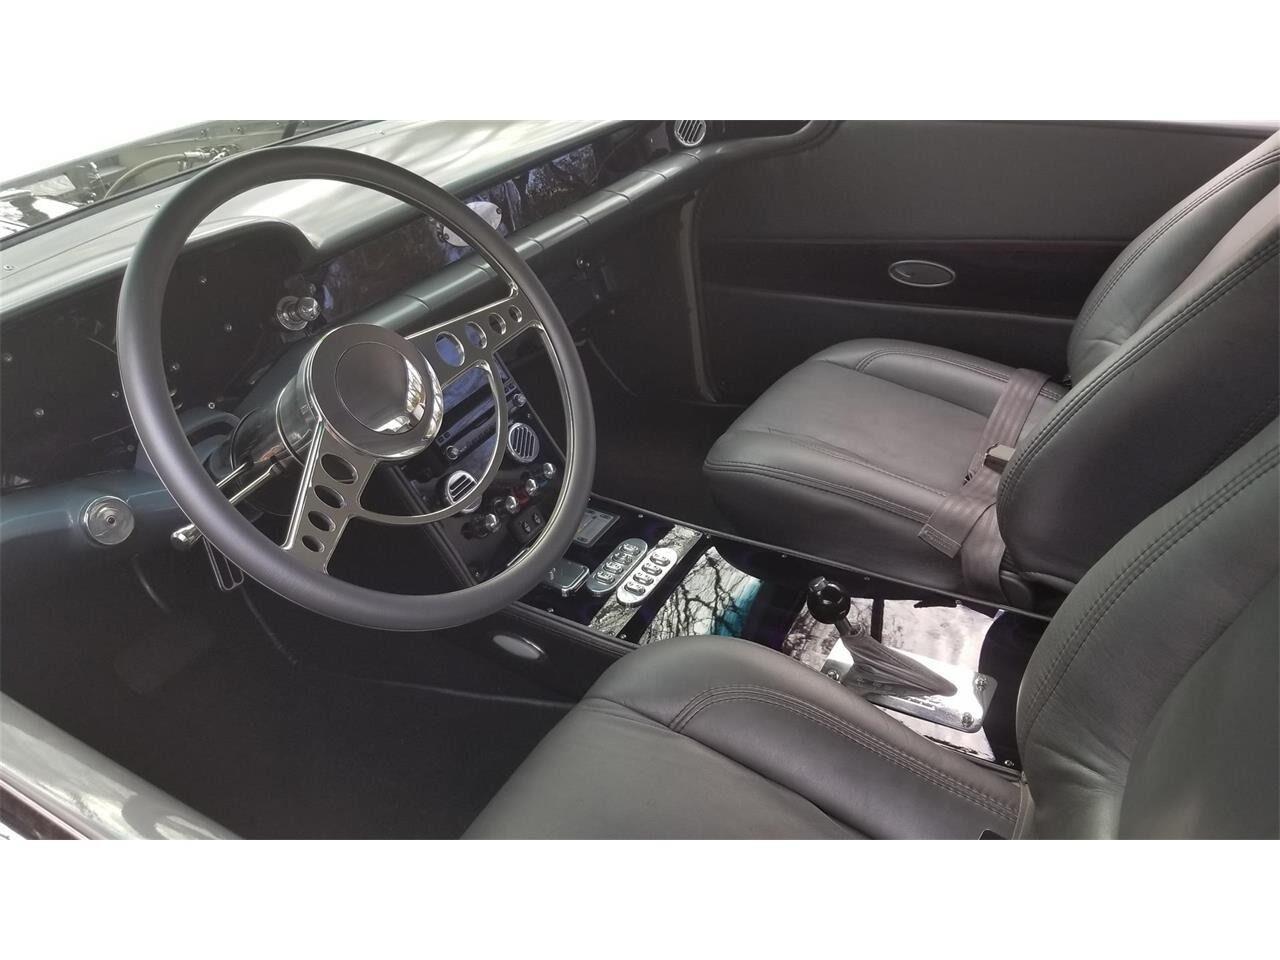 1958 Chevrolet Impala (CC-1253094) for sale in Conroe, Texas